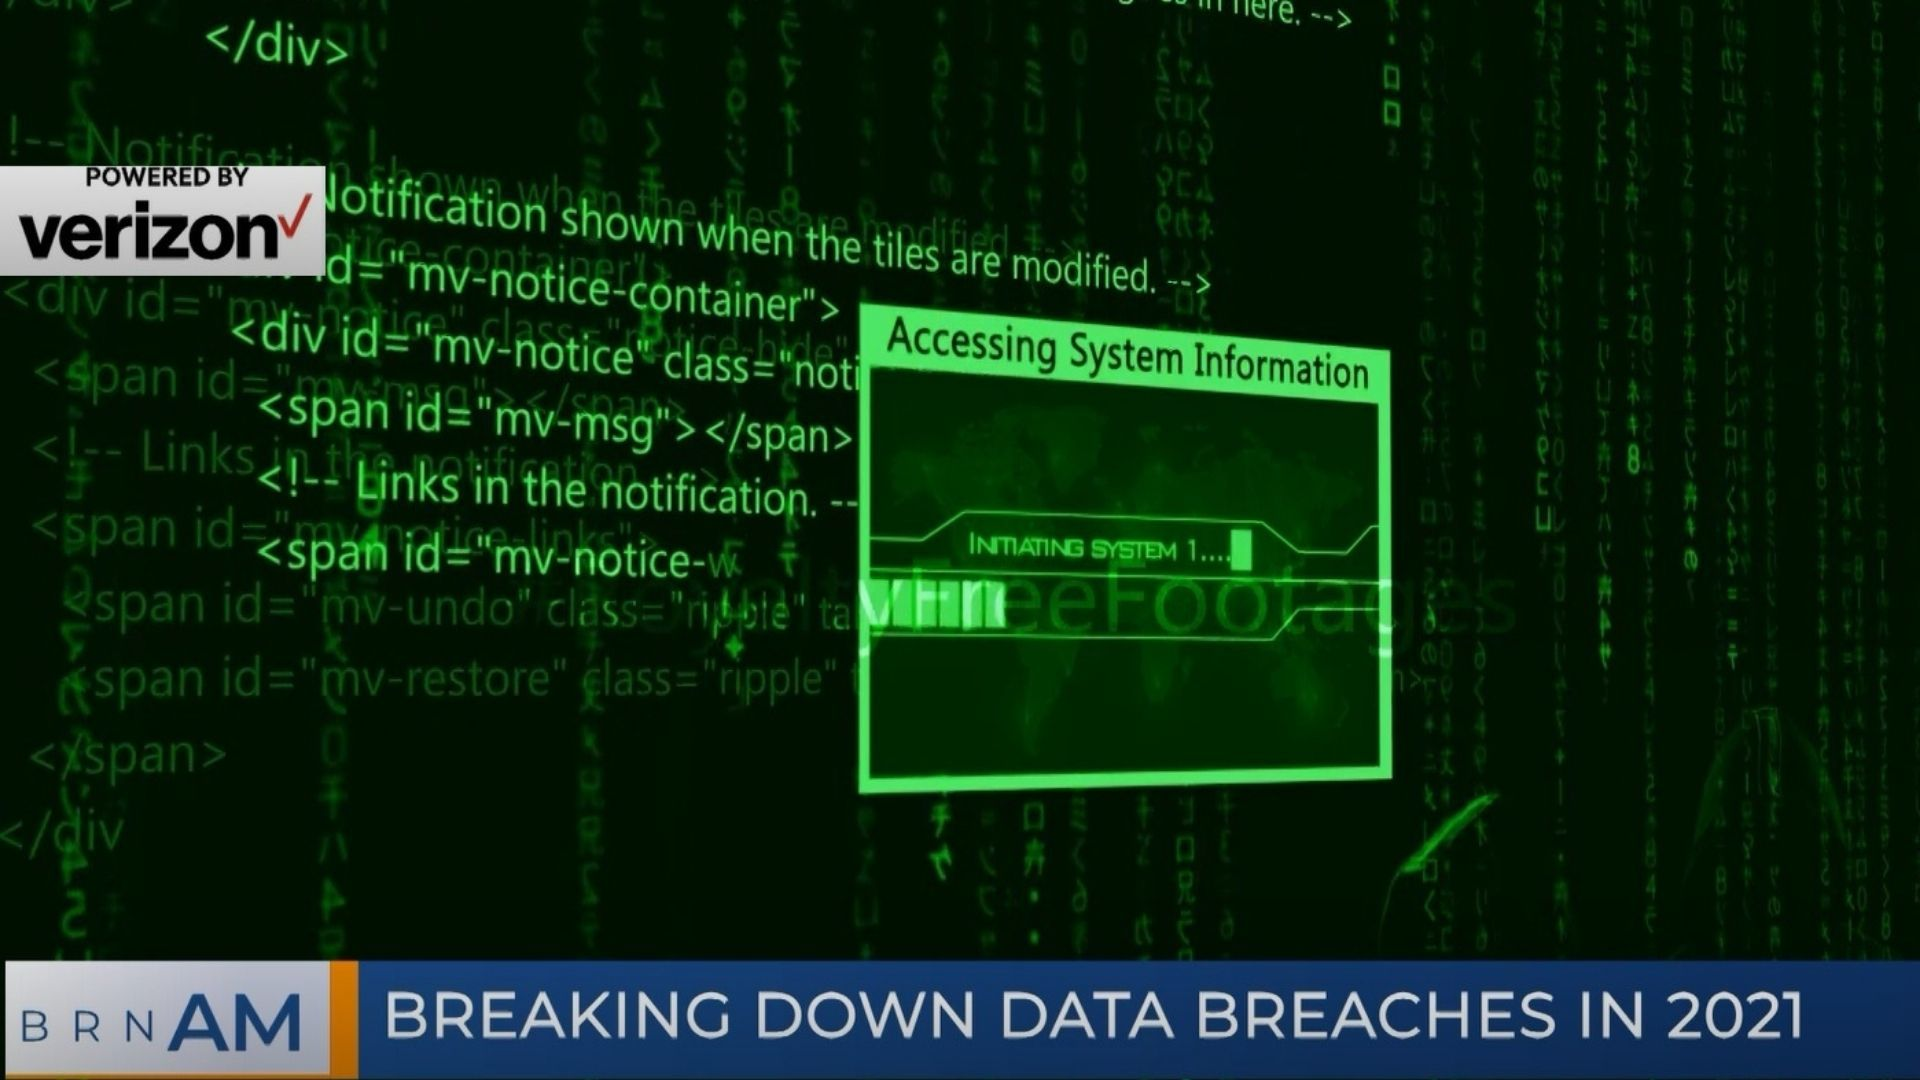 BRN AM   Breaking down data breaches in 2021